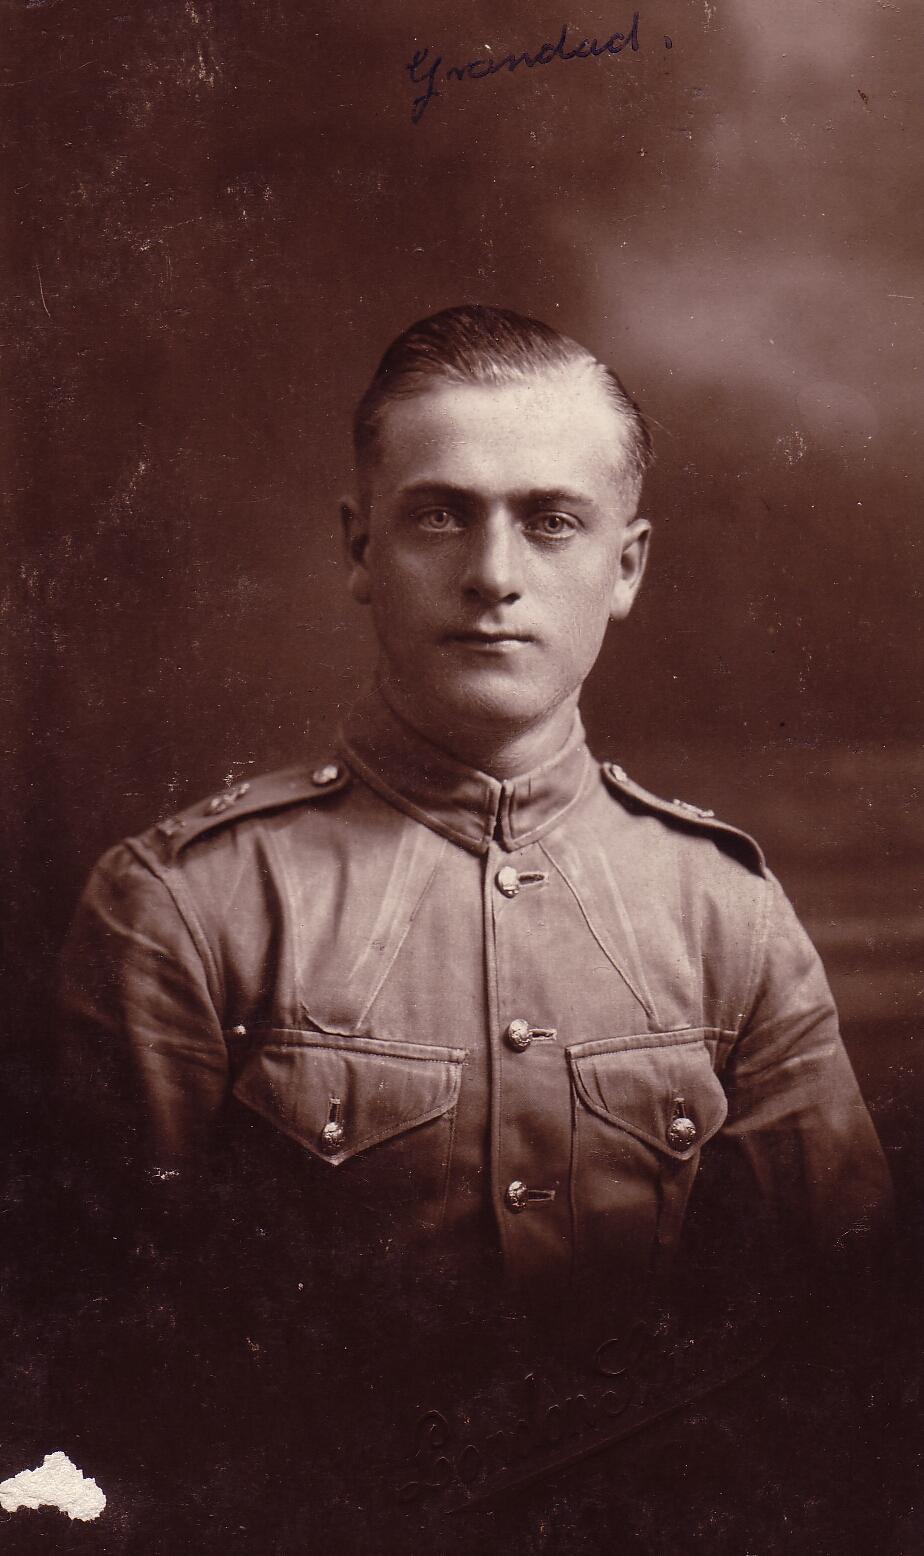 Studio Portrait Soldier, 11th May 1924